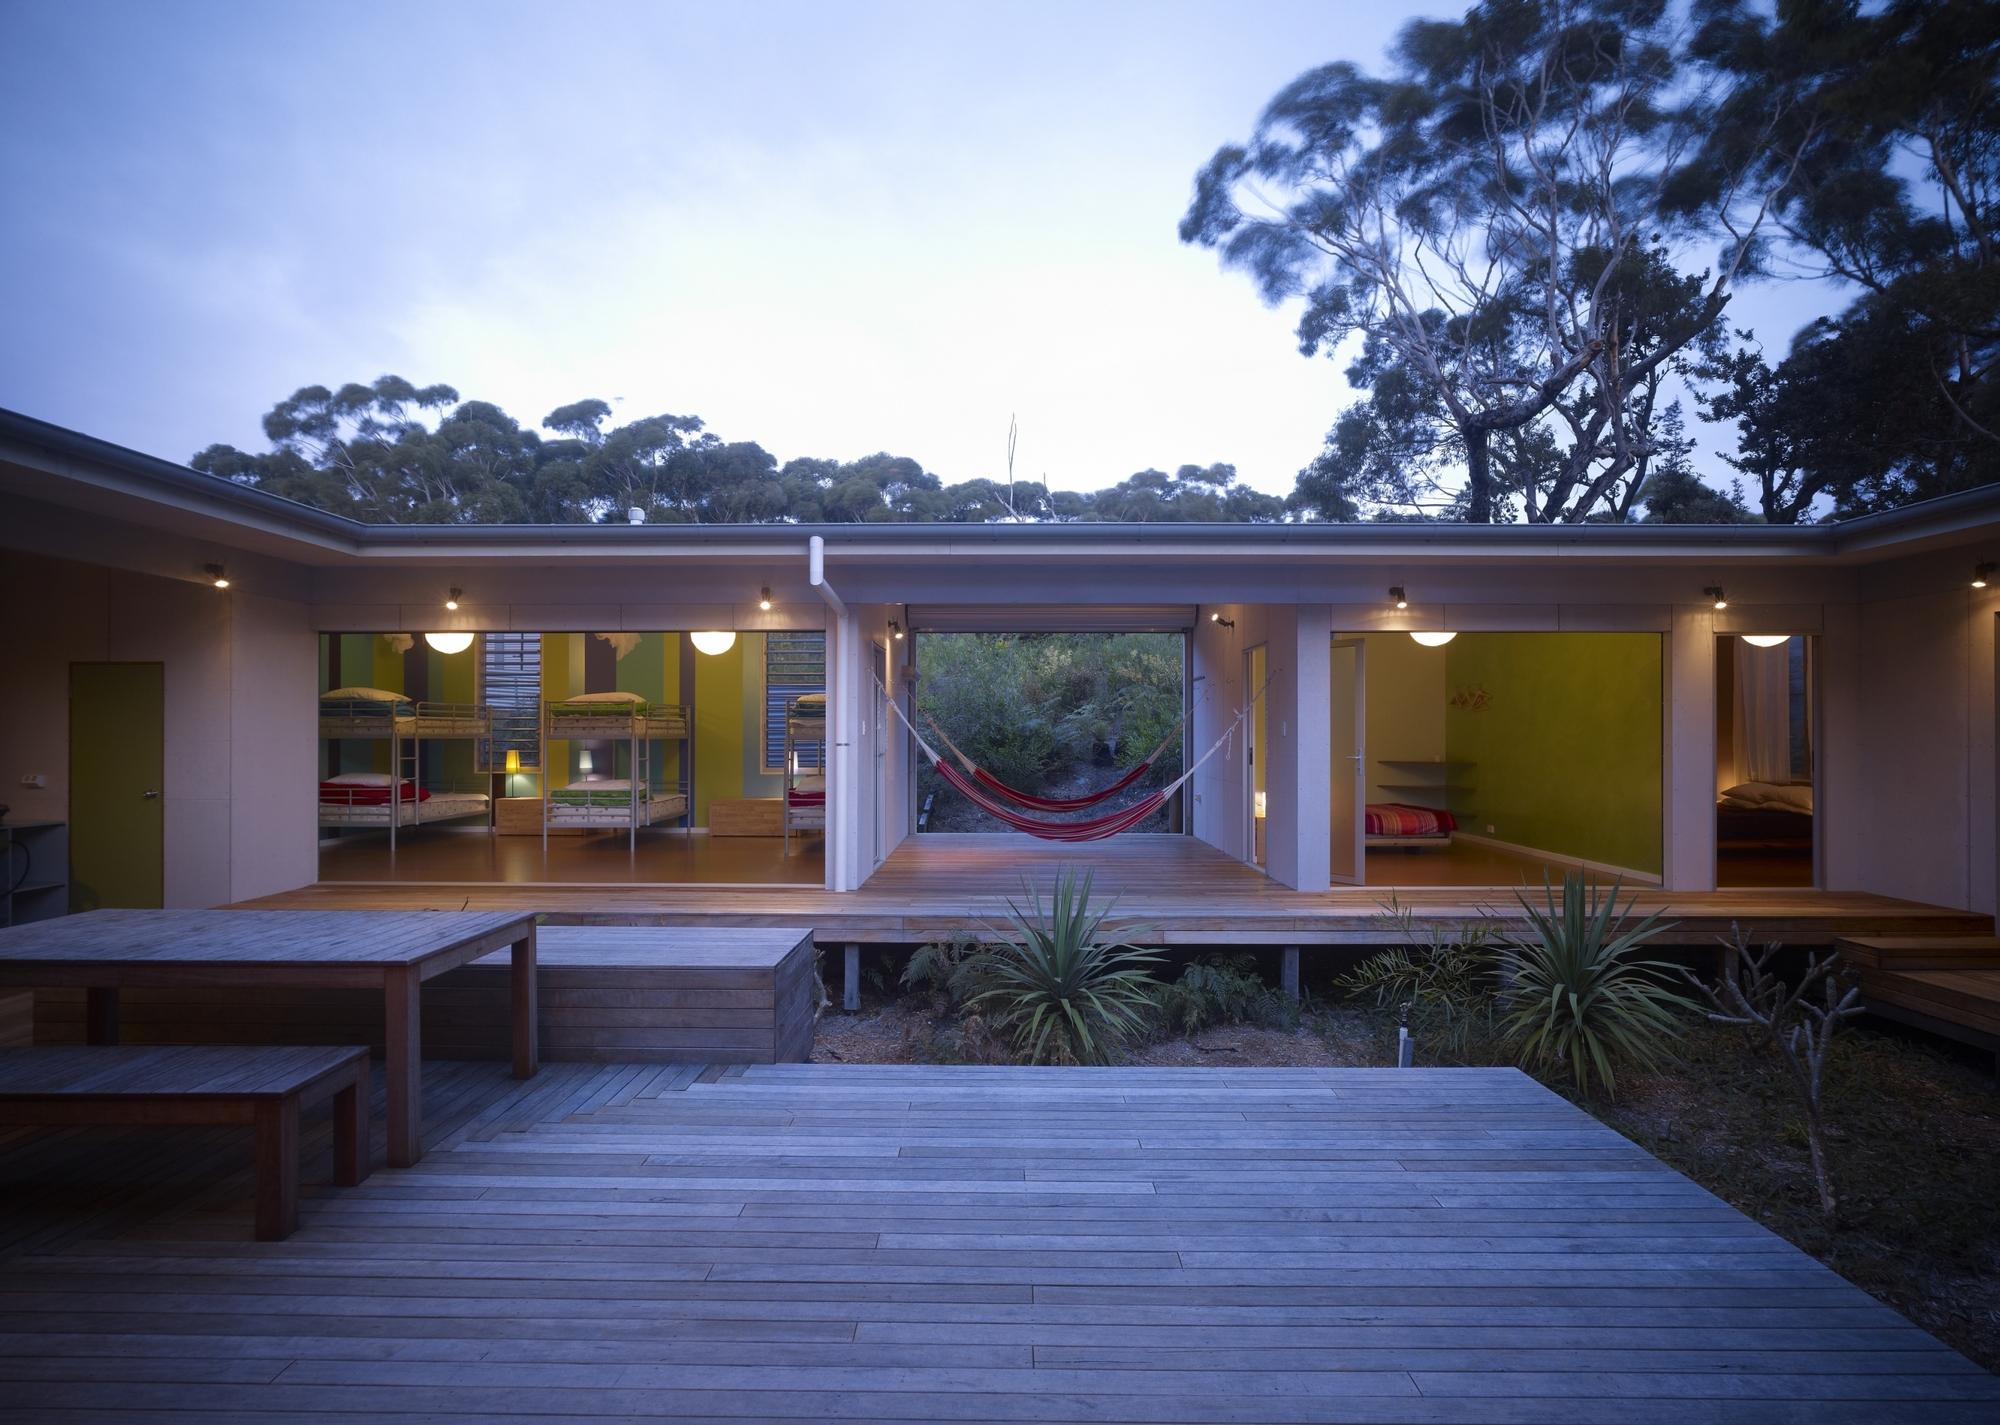 Дом с внутренним двором фото